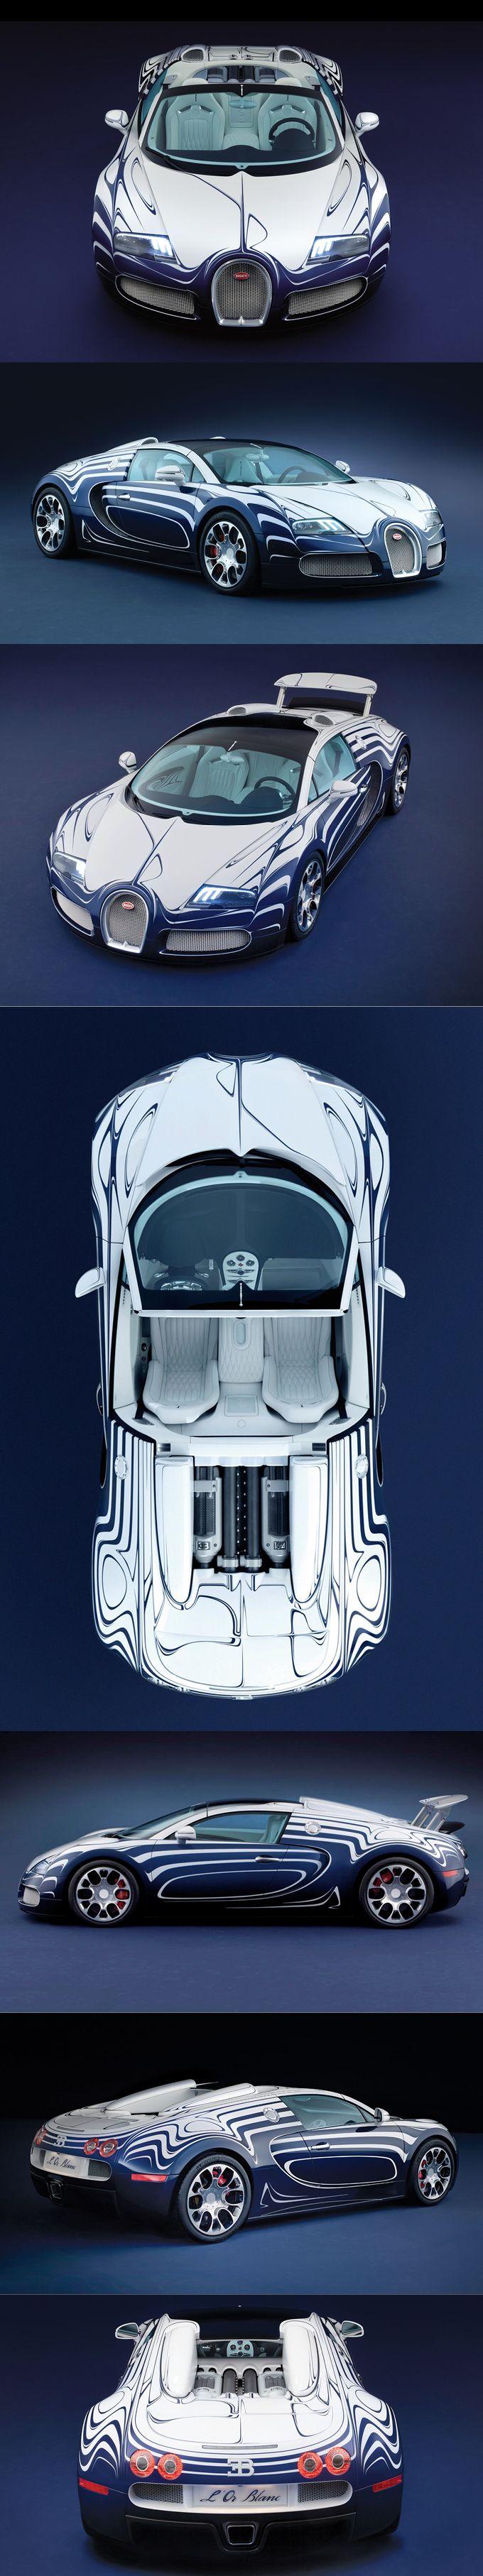 62eb123996a50d5b102687c9846cedb1--frances-oconnor-sporty Inspiring Bugatti Veyron Price Australian Dollars Cars Trend